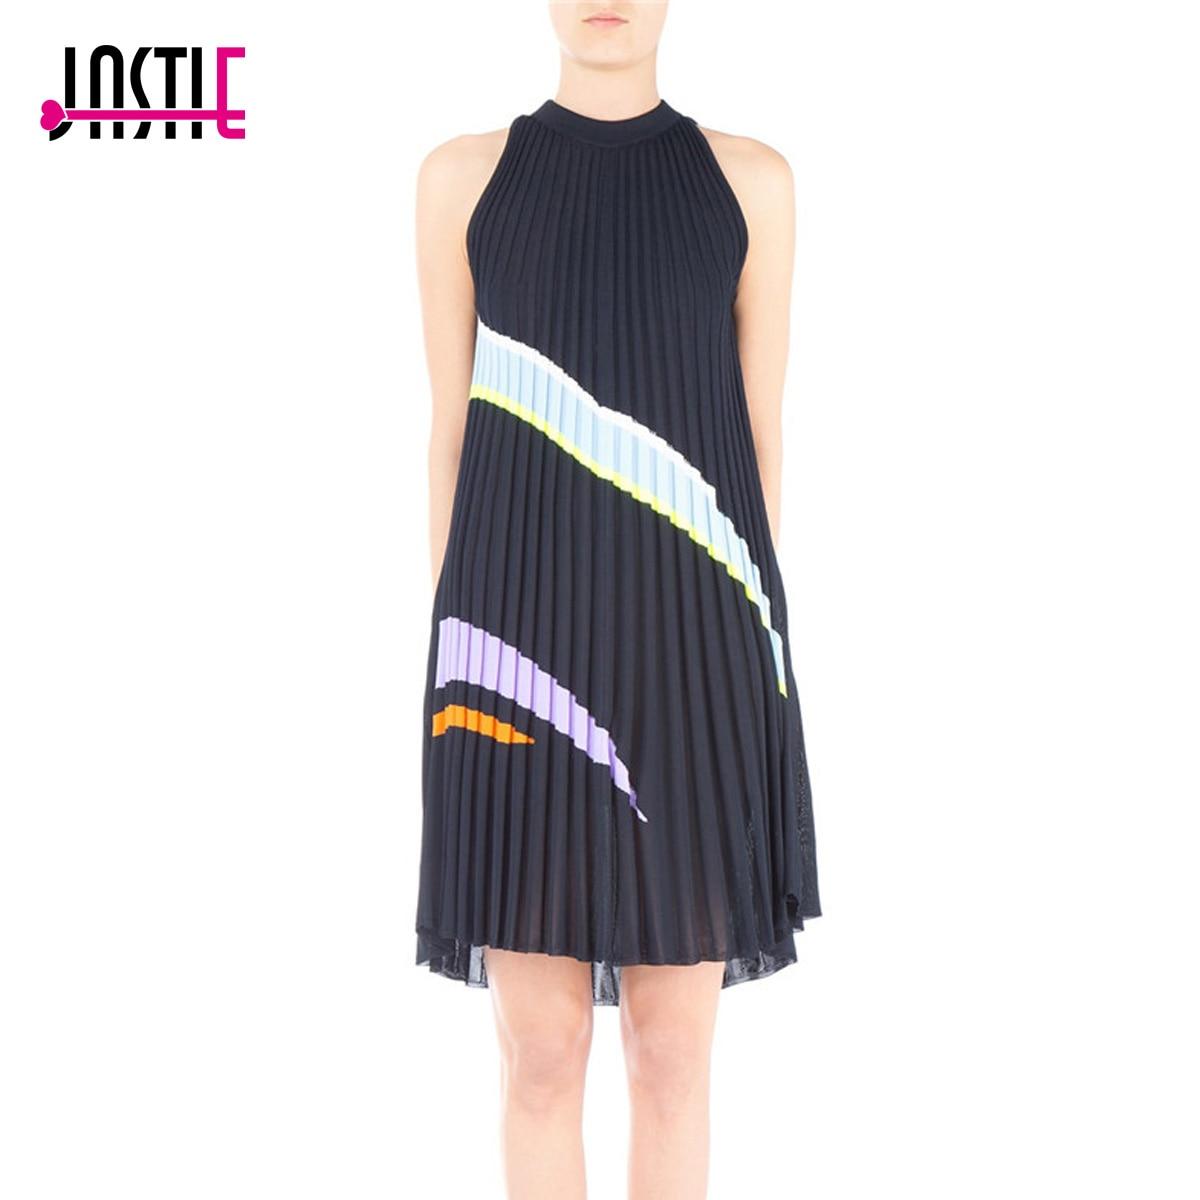 Jastie Asymmetric Color Striped Knitted Pleated Dress O-Neck Sleeveless Midi Dresses Bodycon Autumn Winter Dress Women Vestidos plain asymmetric v neck ruffled work bodycon dress